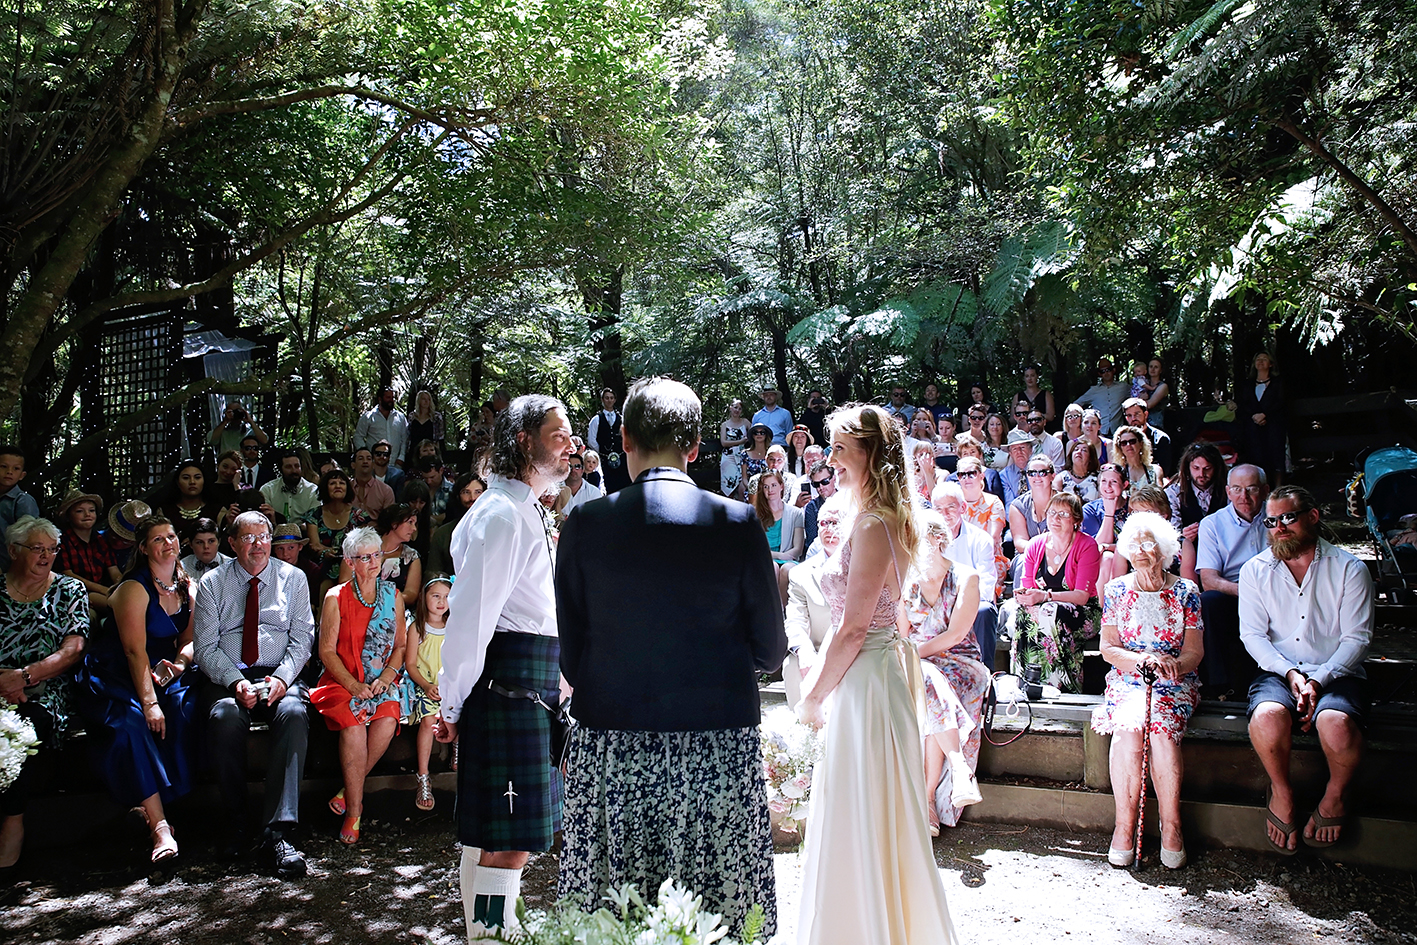 Elizabeth_May_Bridal_Wedding Photos - Brightlights 200.jpg